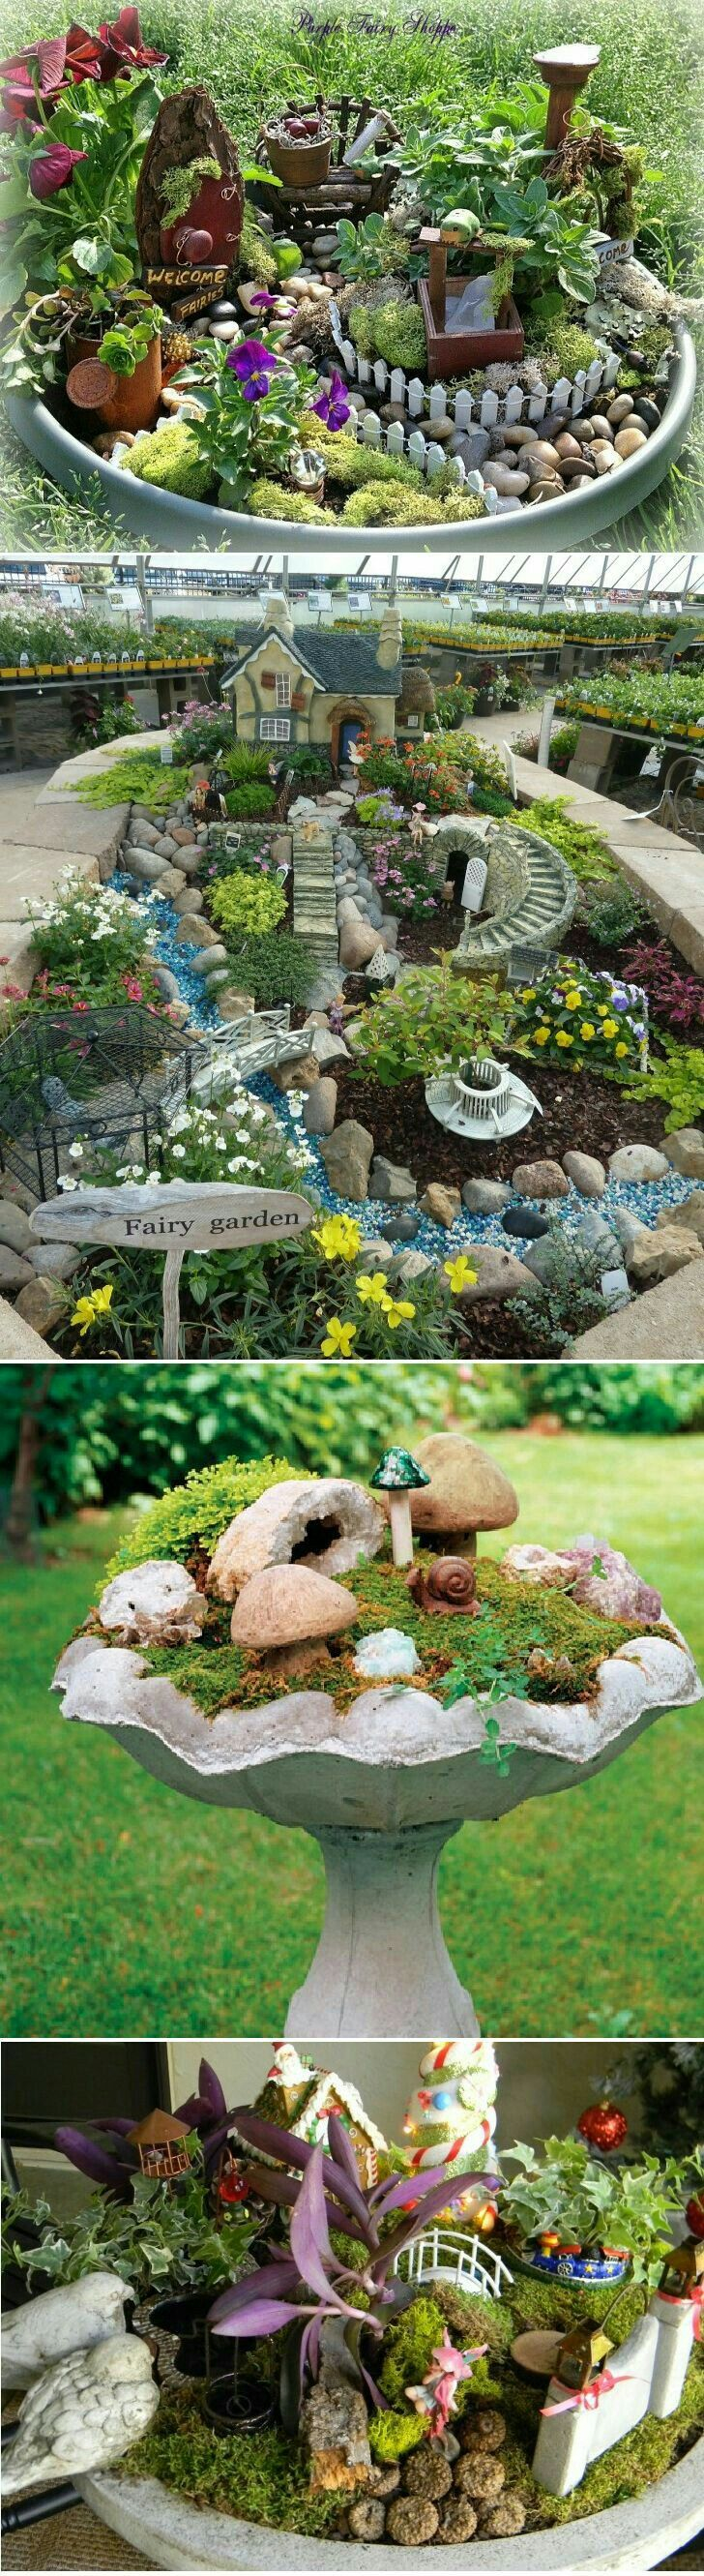 DIY Ideas How To Make Fairy Garden   Gardening Designing. Oh My Gosh.  Really Want To Do The Bird Bath Mini Garden!